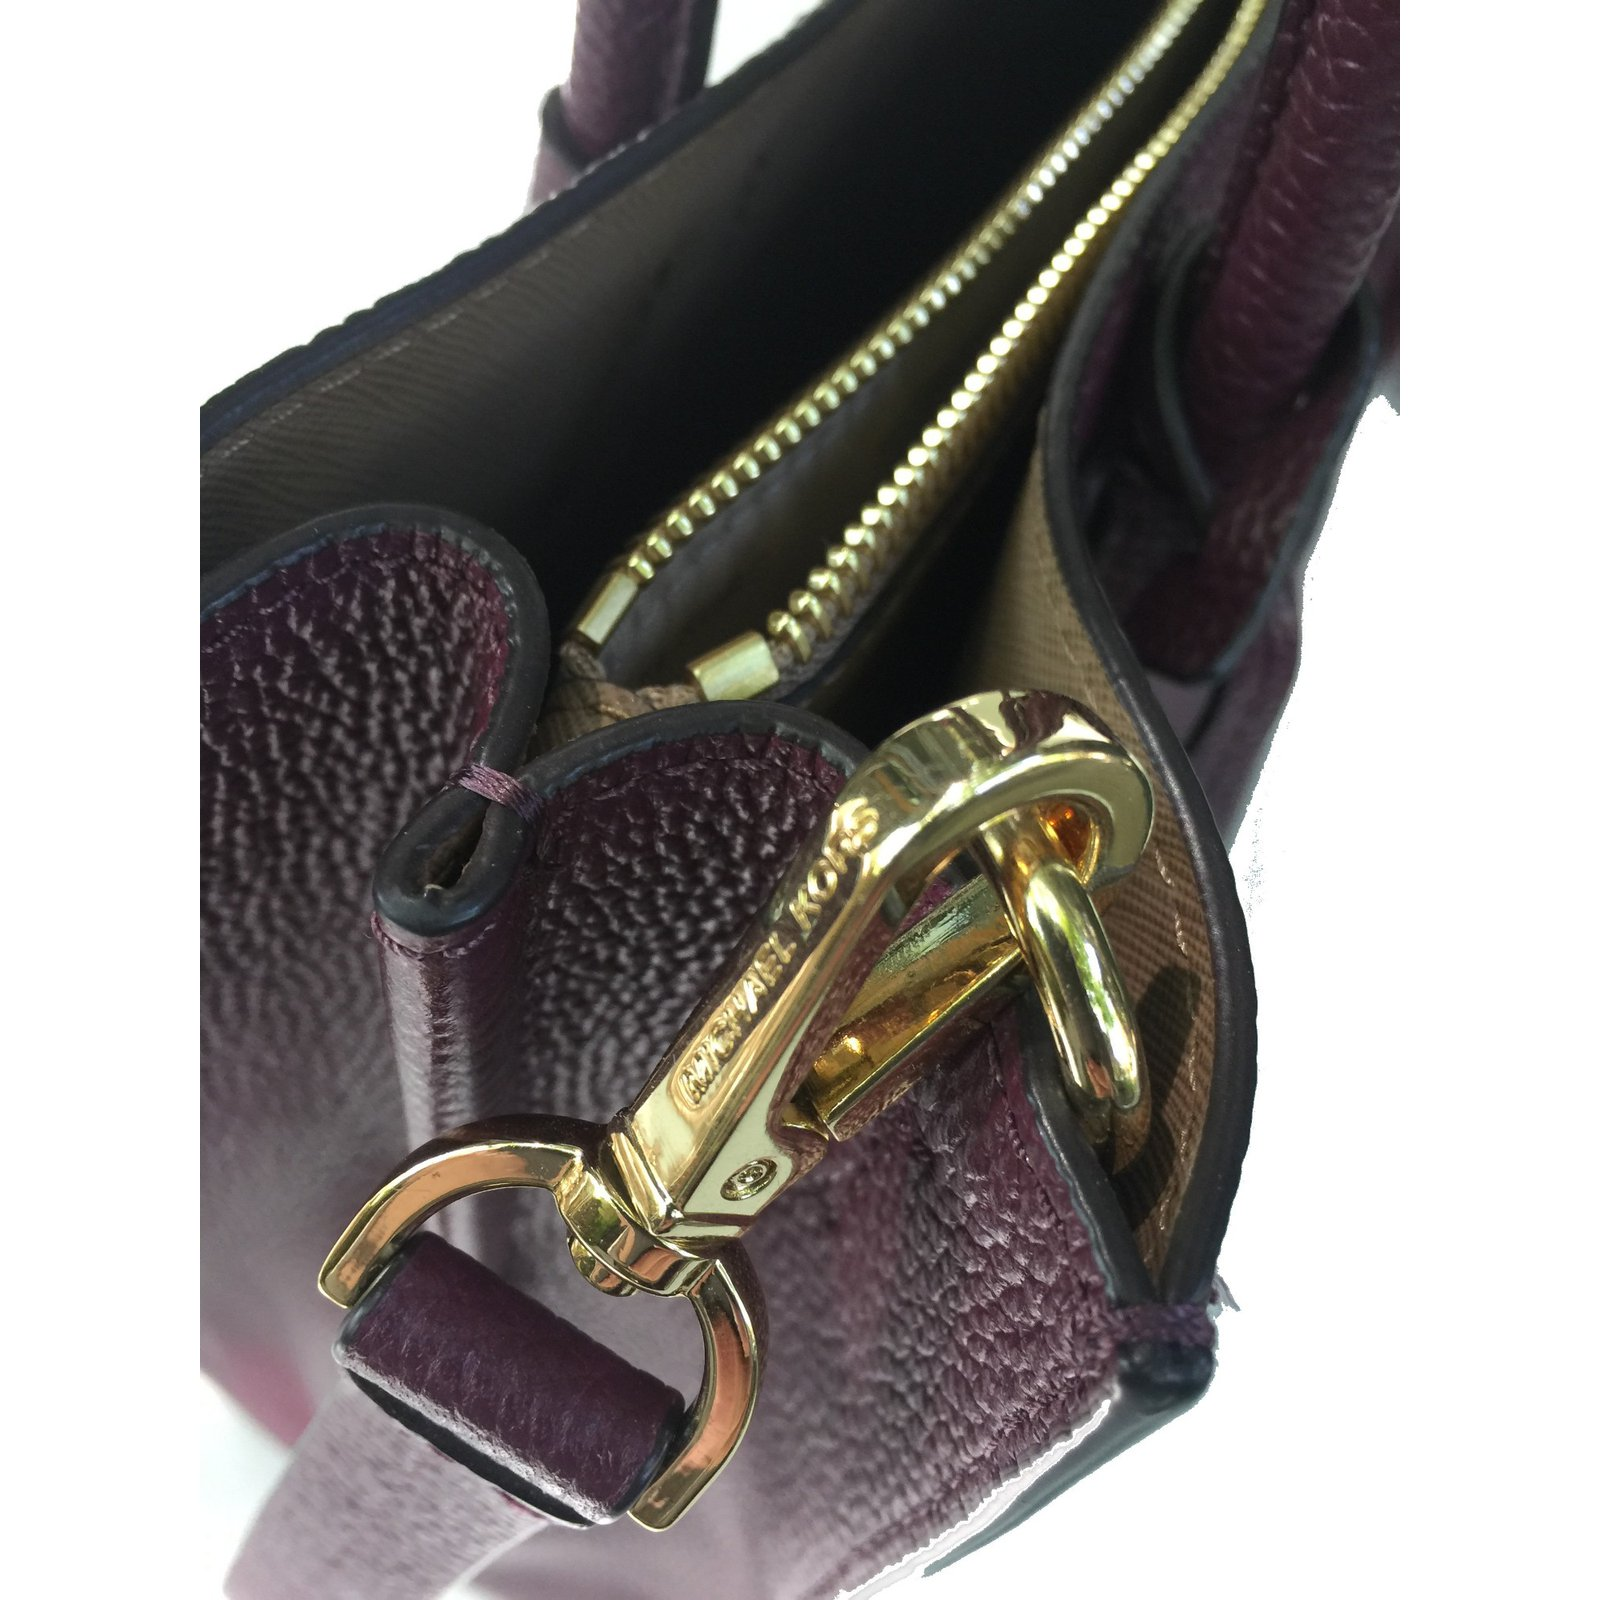 9d7fd66adbd6 Michael Kors Mercer large handbag in dark plum Handbags Leather Purple  ref.67676 - Joli Closet